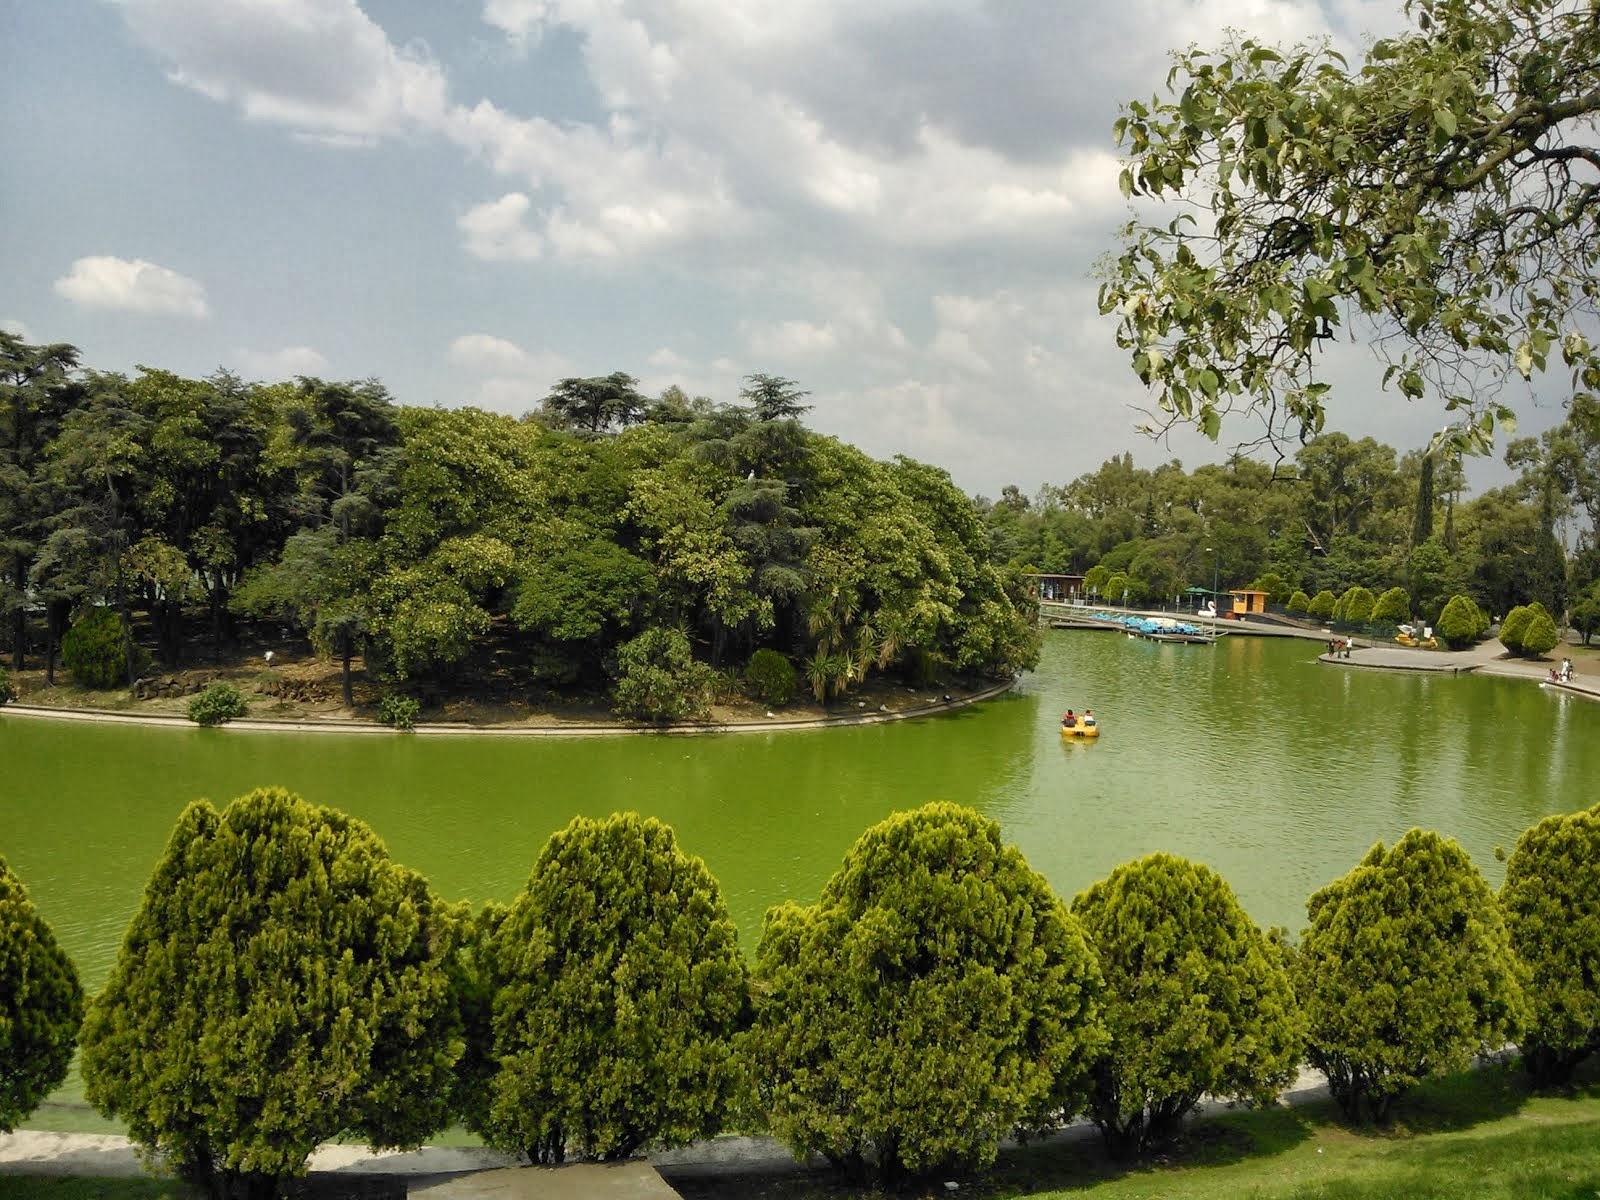 En el lago de Chapultepec